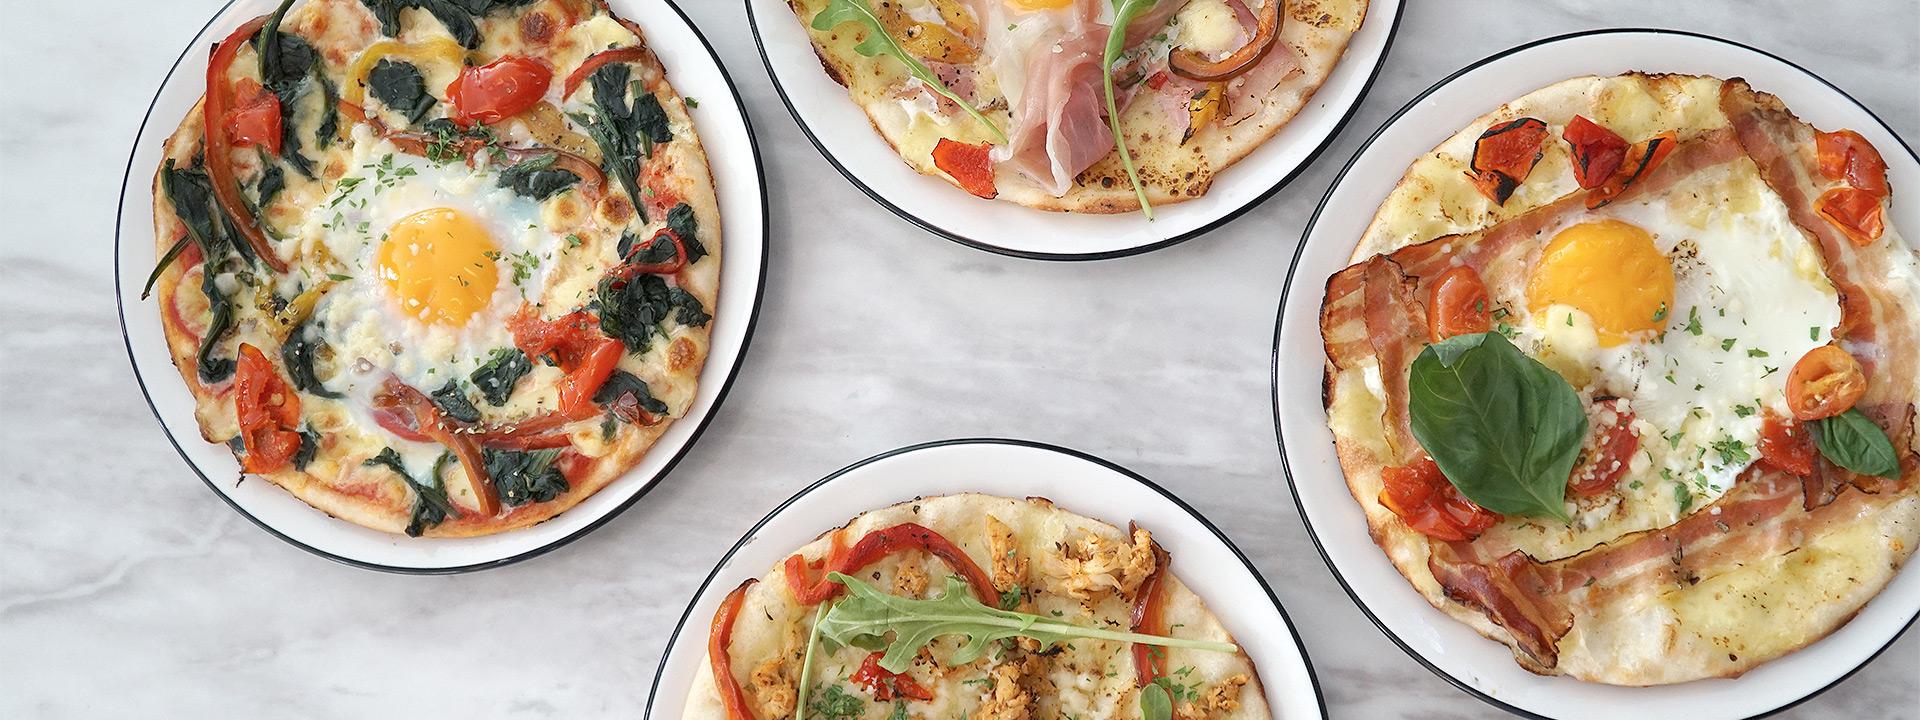 PizzaExpress Singapore - Breakfast Pizzas